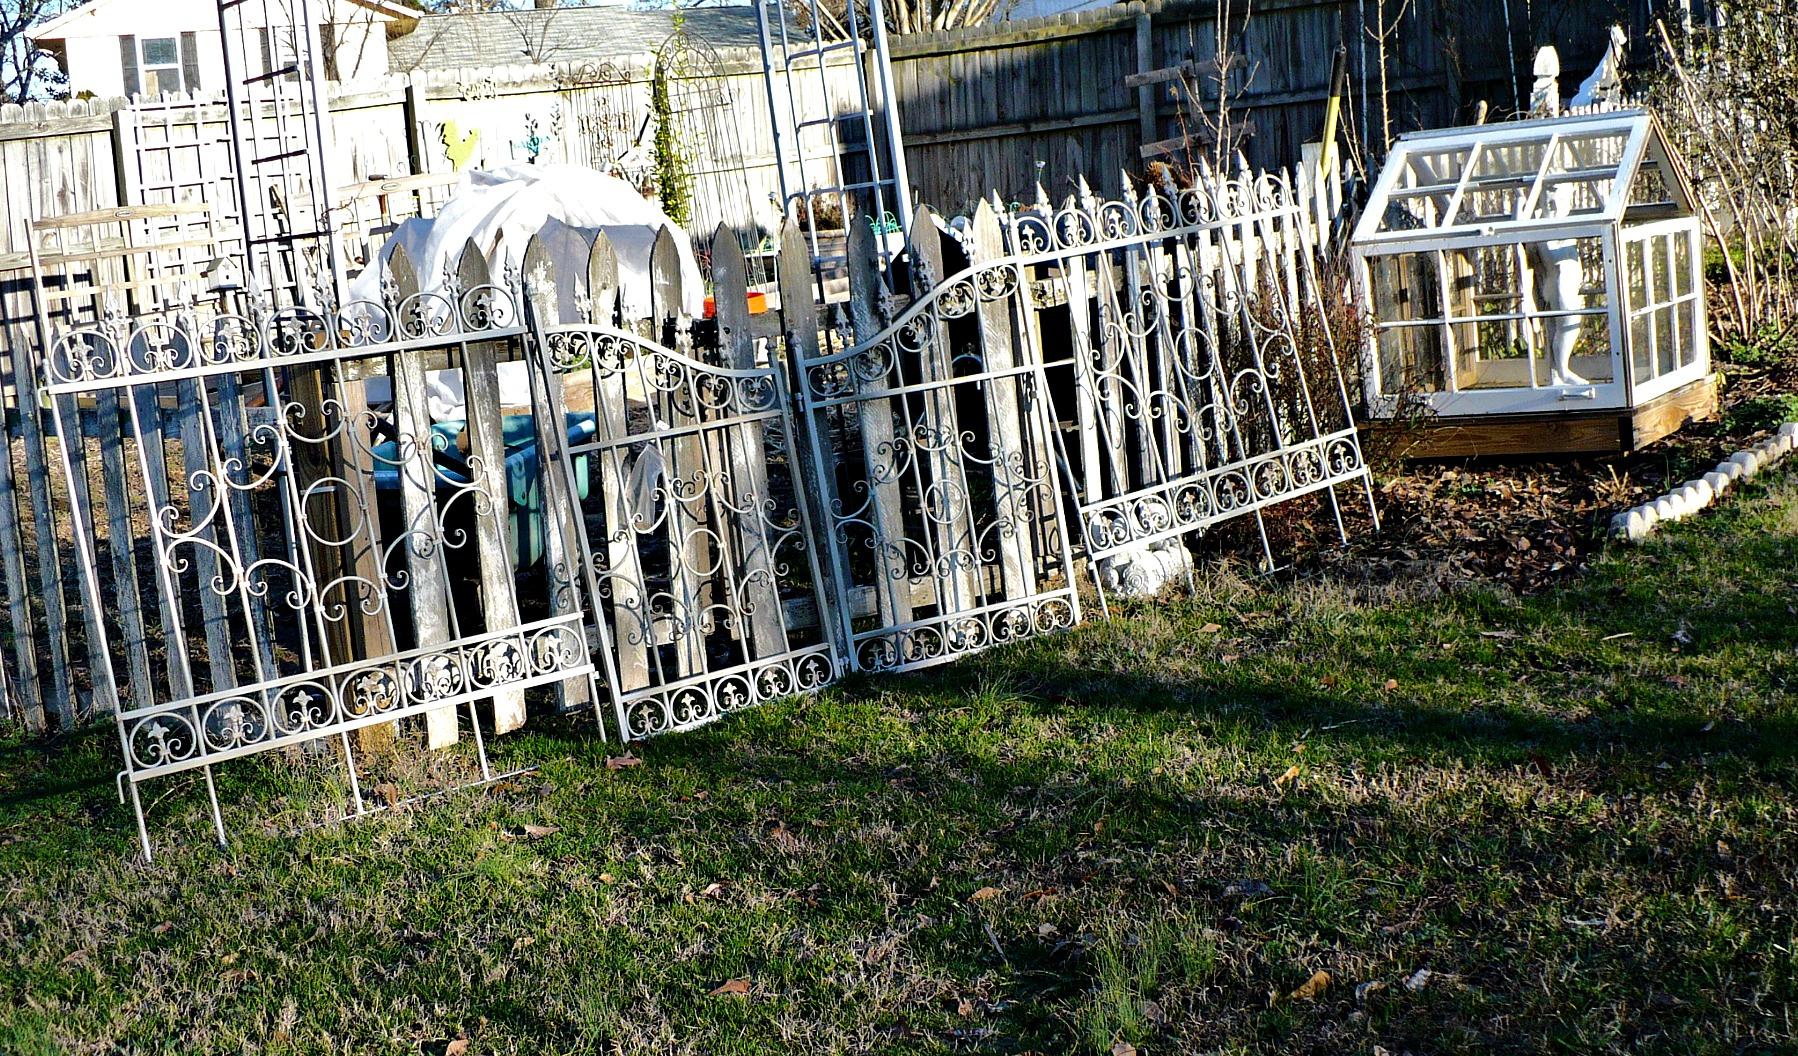 My Thrifty Garden Gate Find A Cultivated Nest - Garden gate for sale